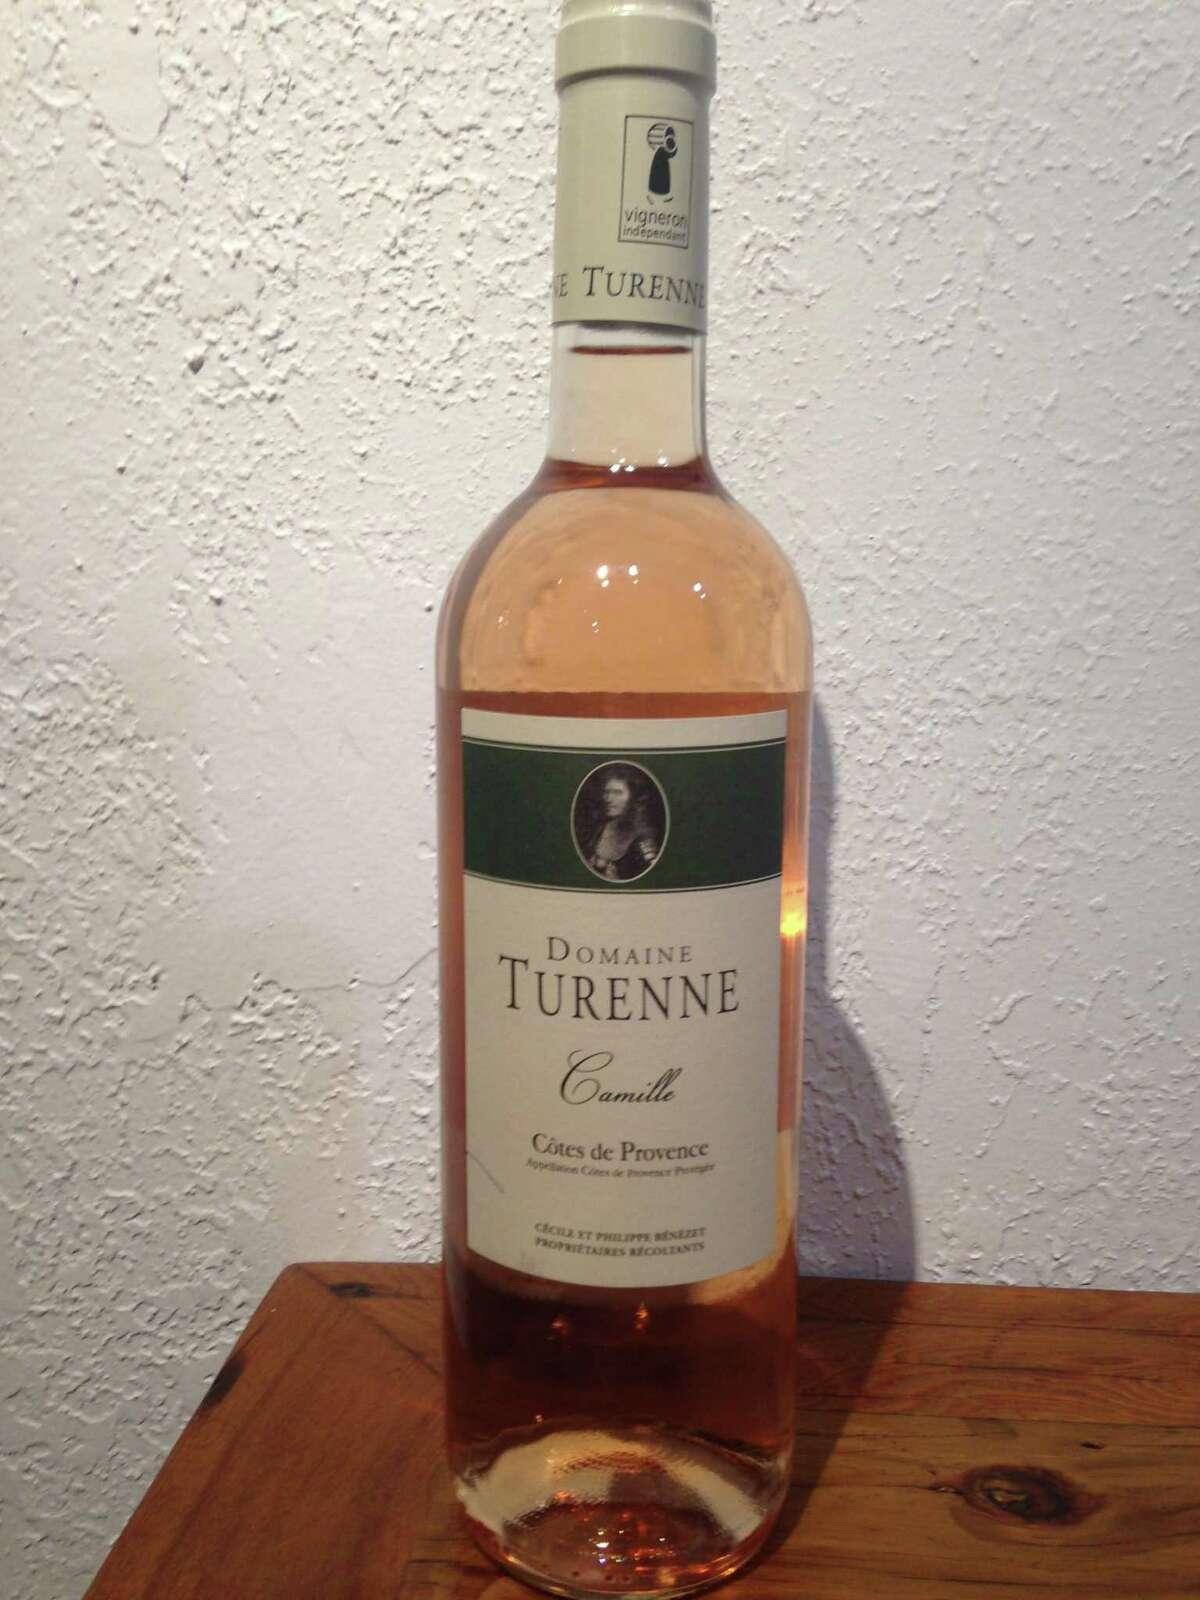 2013 Domaine Turenne Cuvée Camille